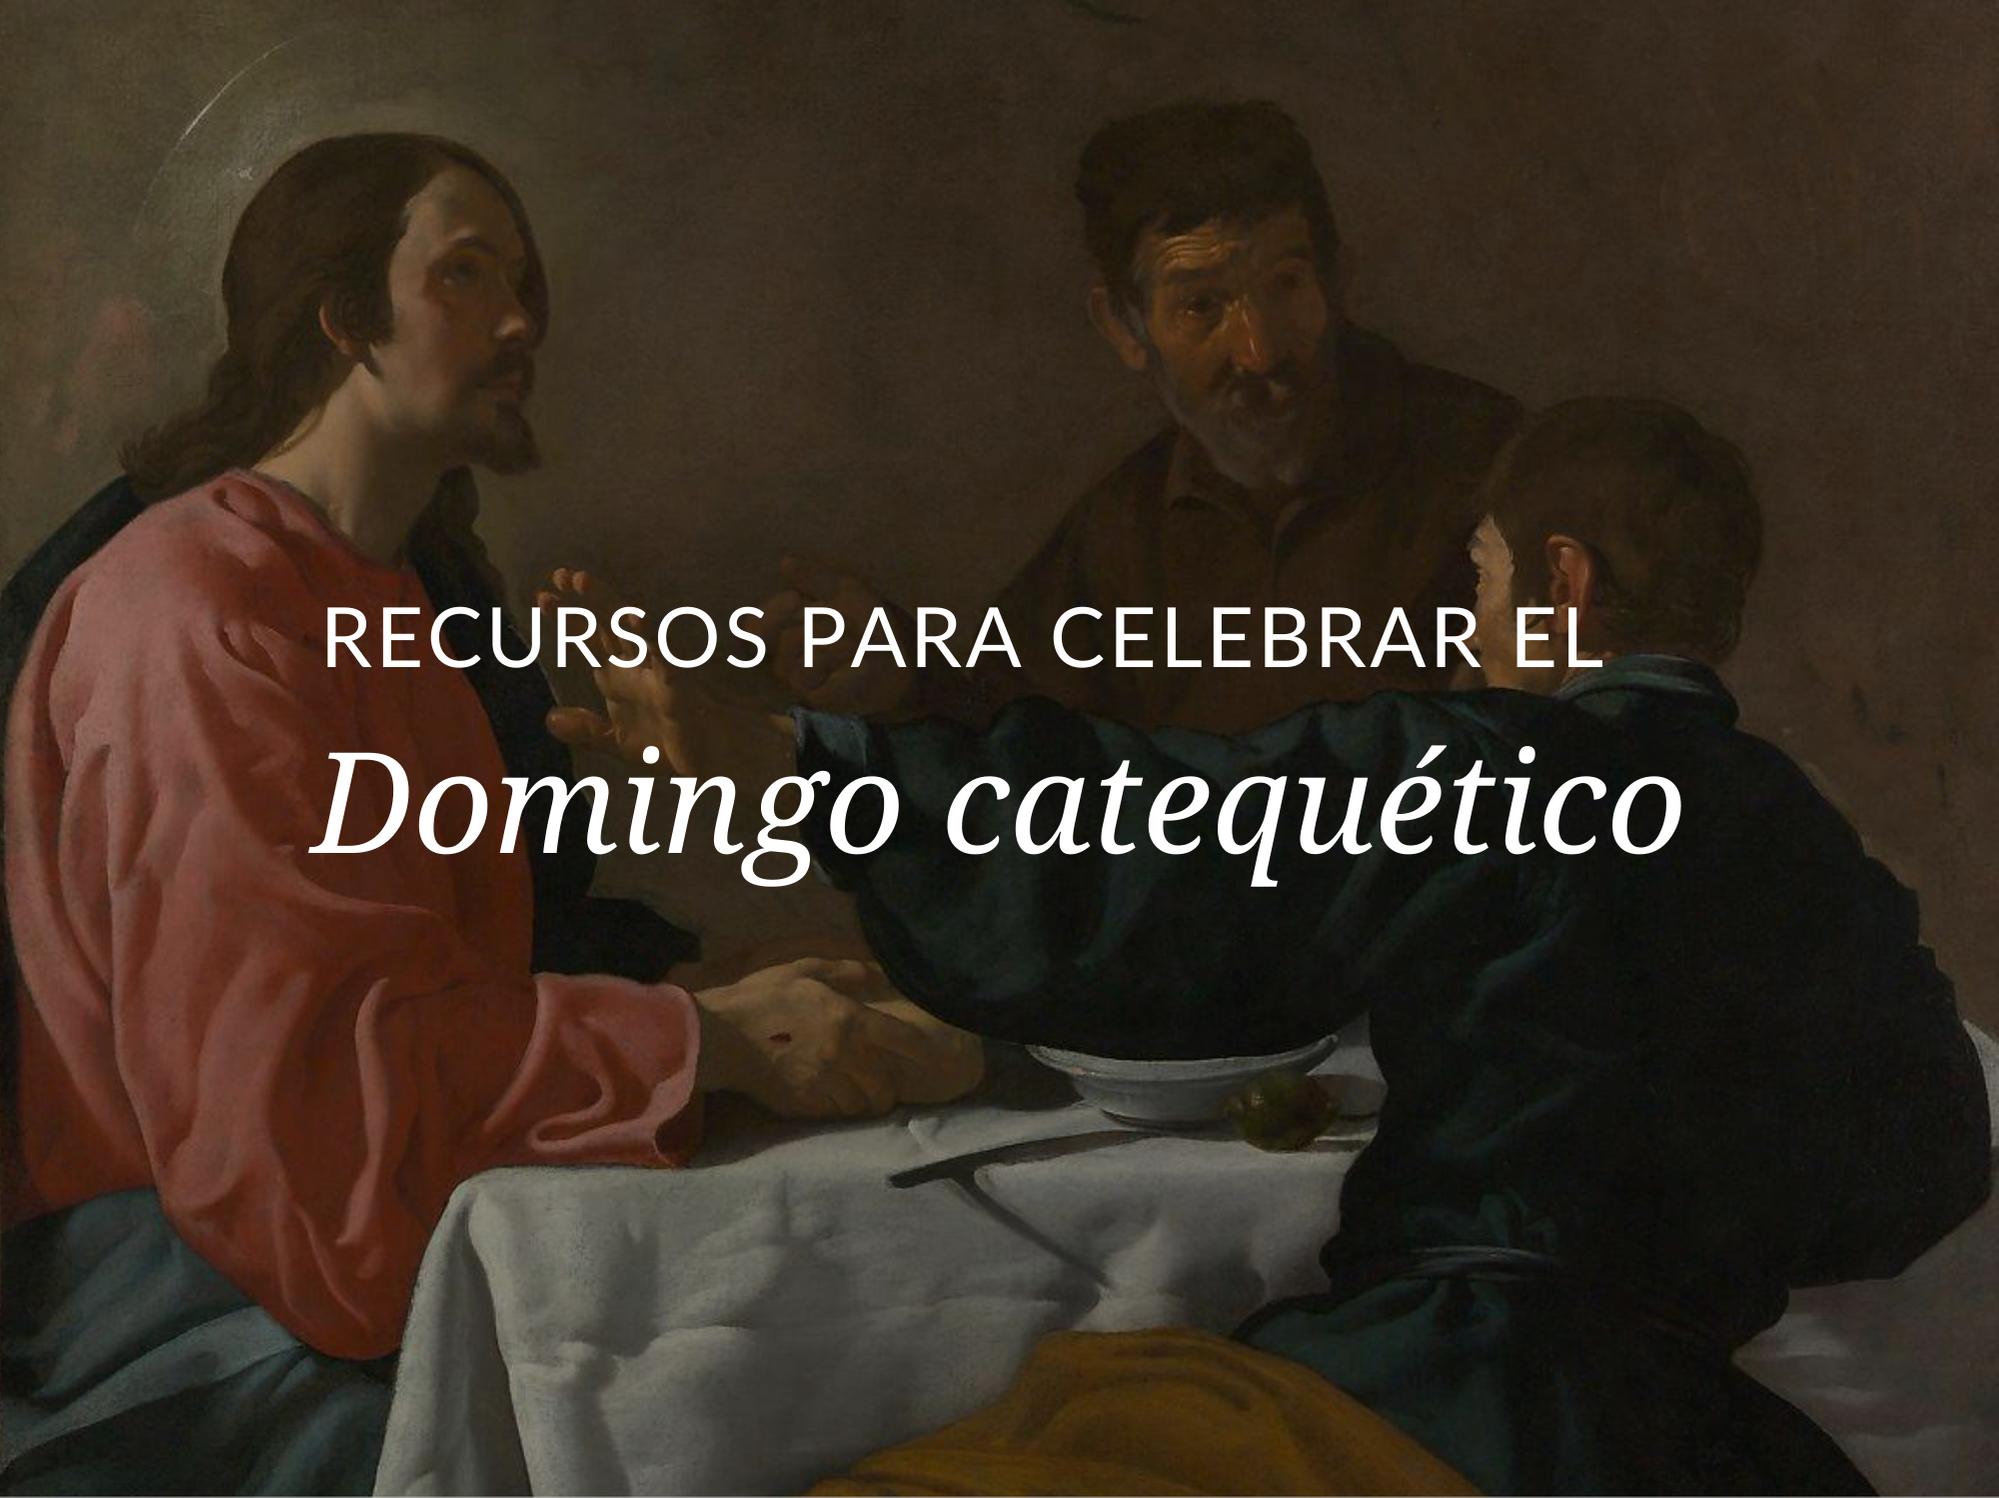 el-domingo-catequetico-2020